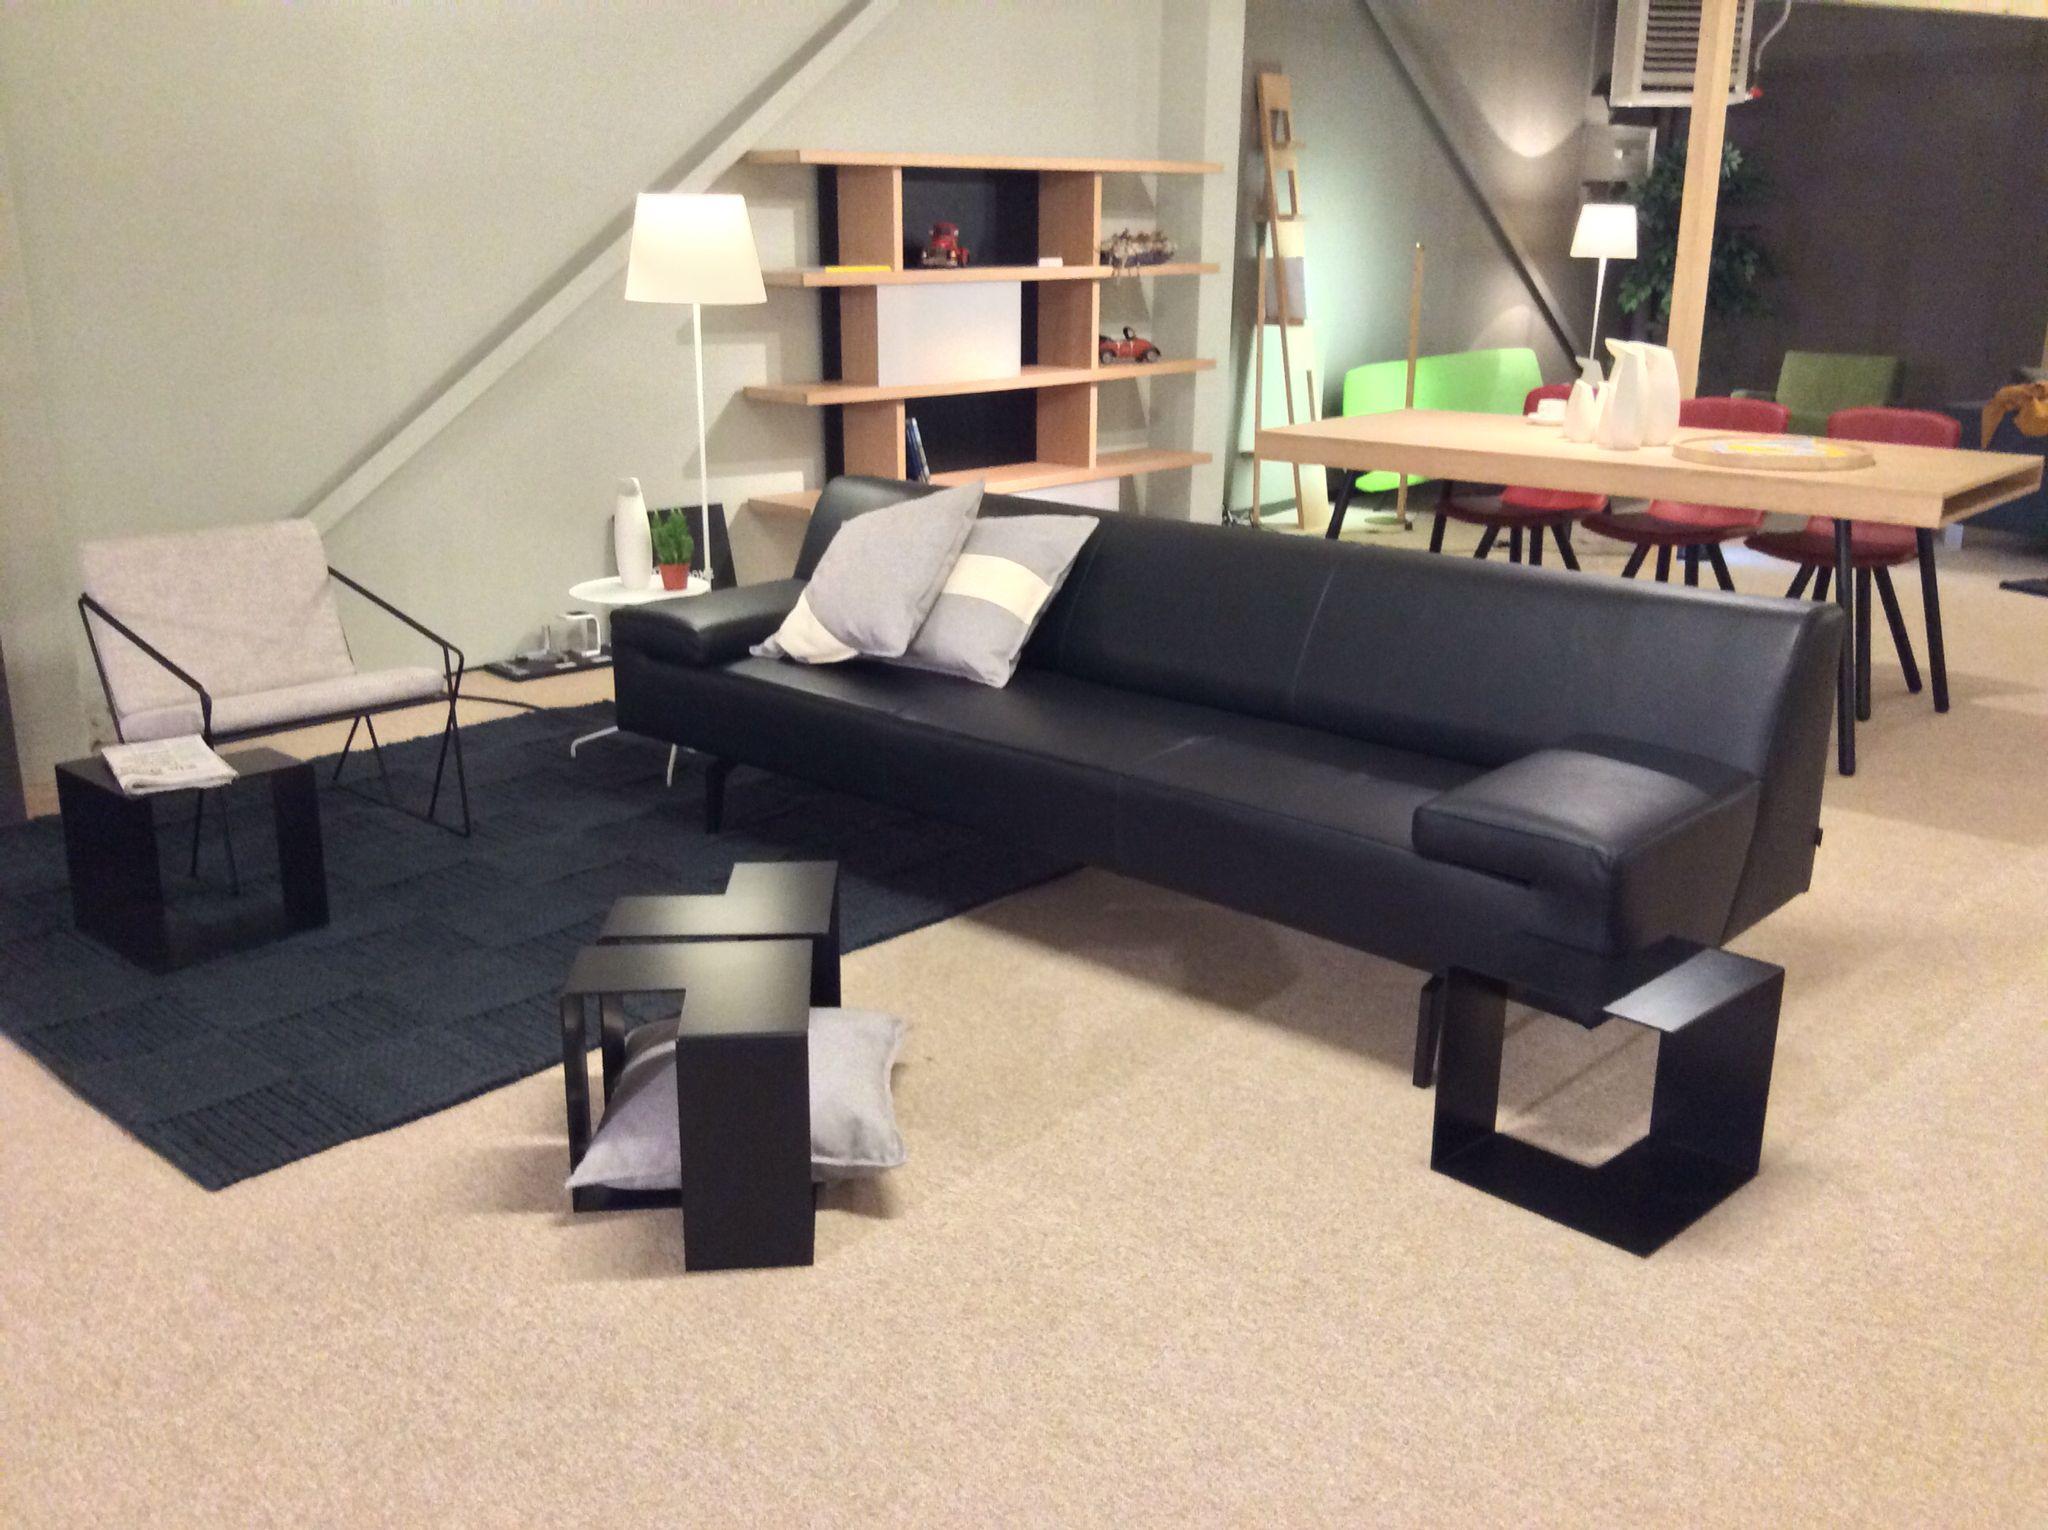 Sofa rundecke  Moome@Beusichem: sofa Noa, table Jigsaw, Carpet Knitted, chair ...